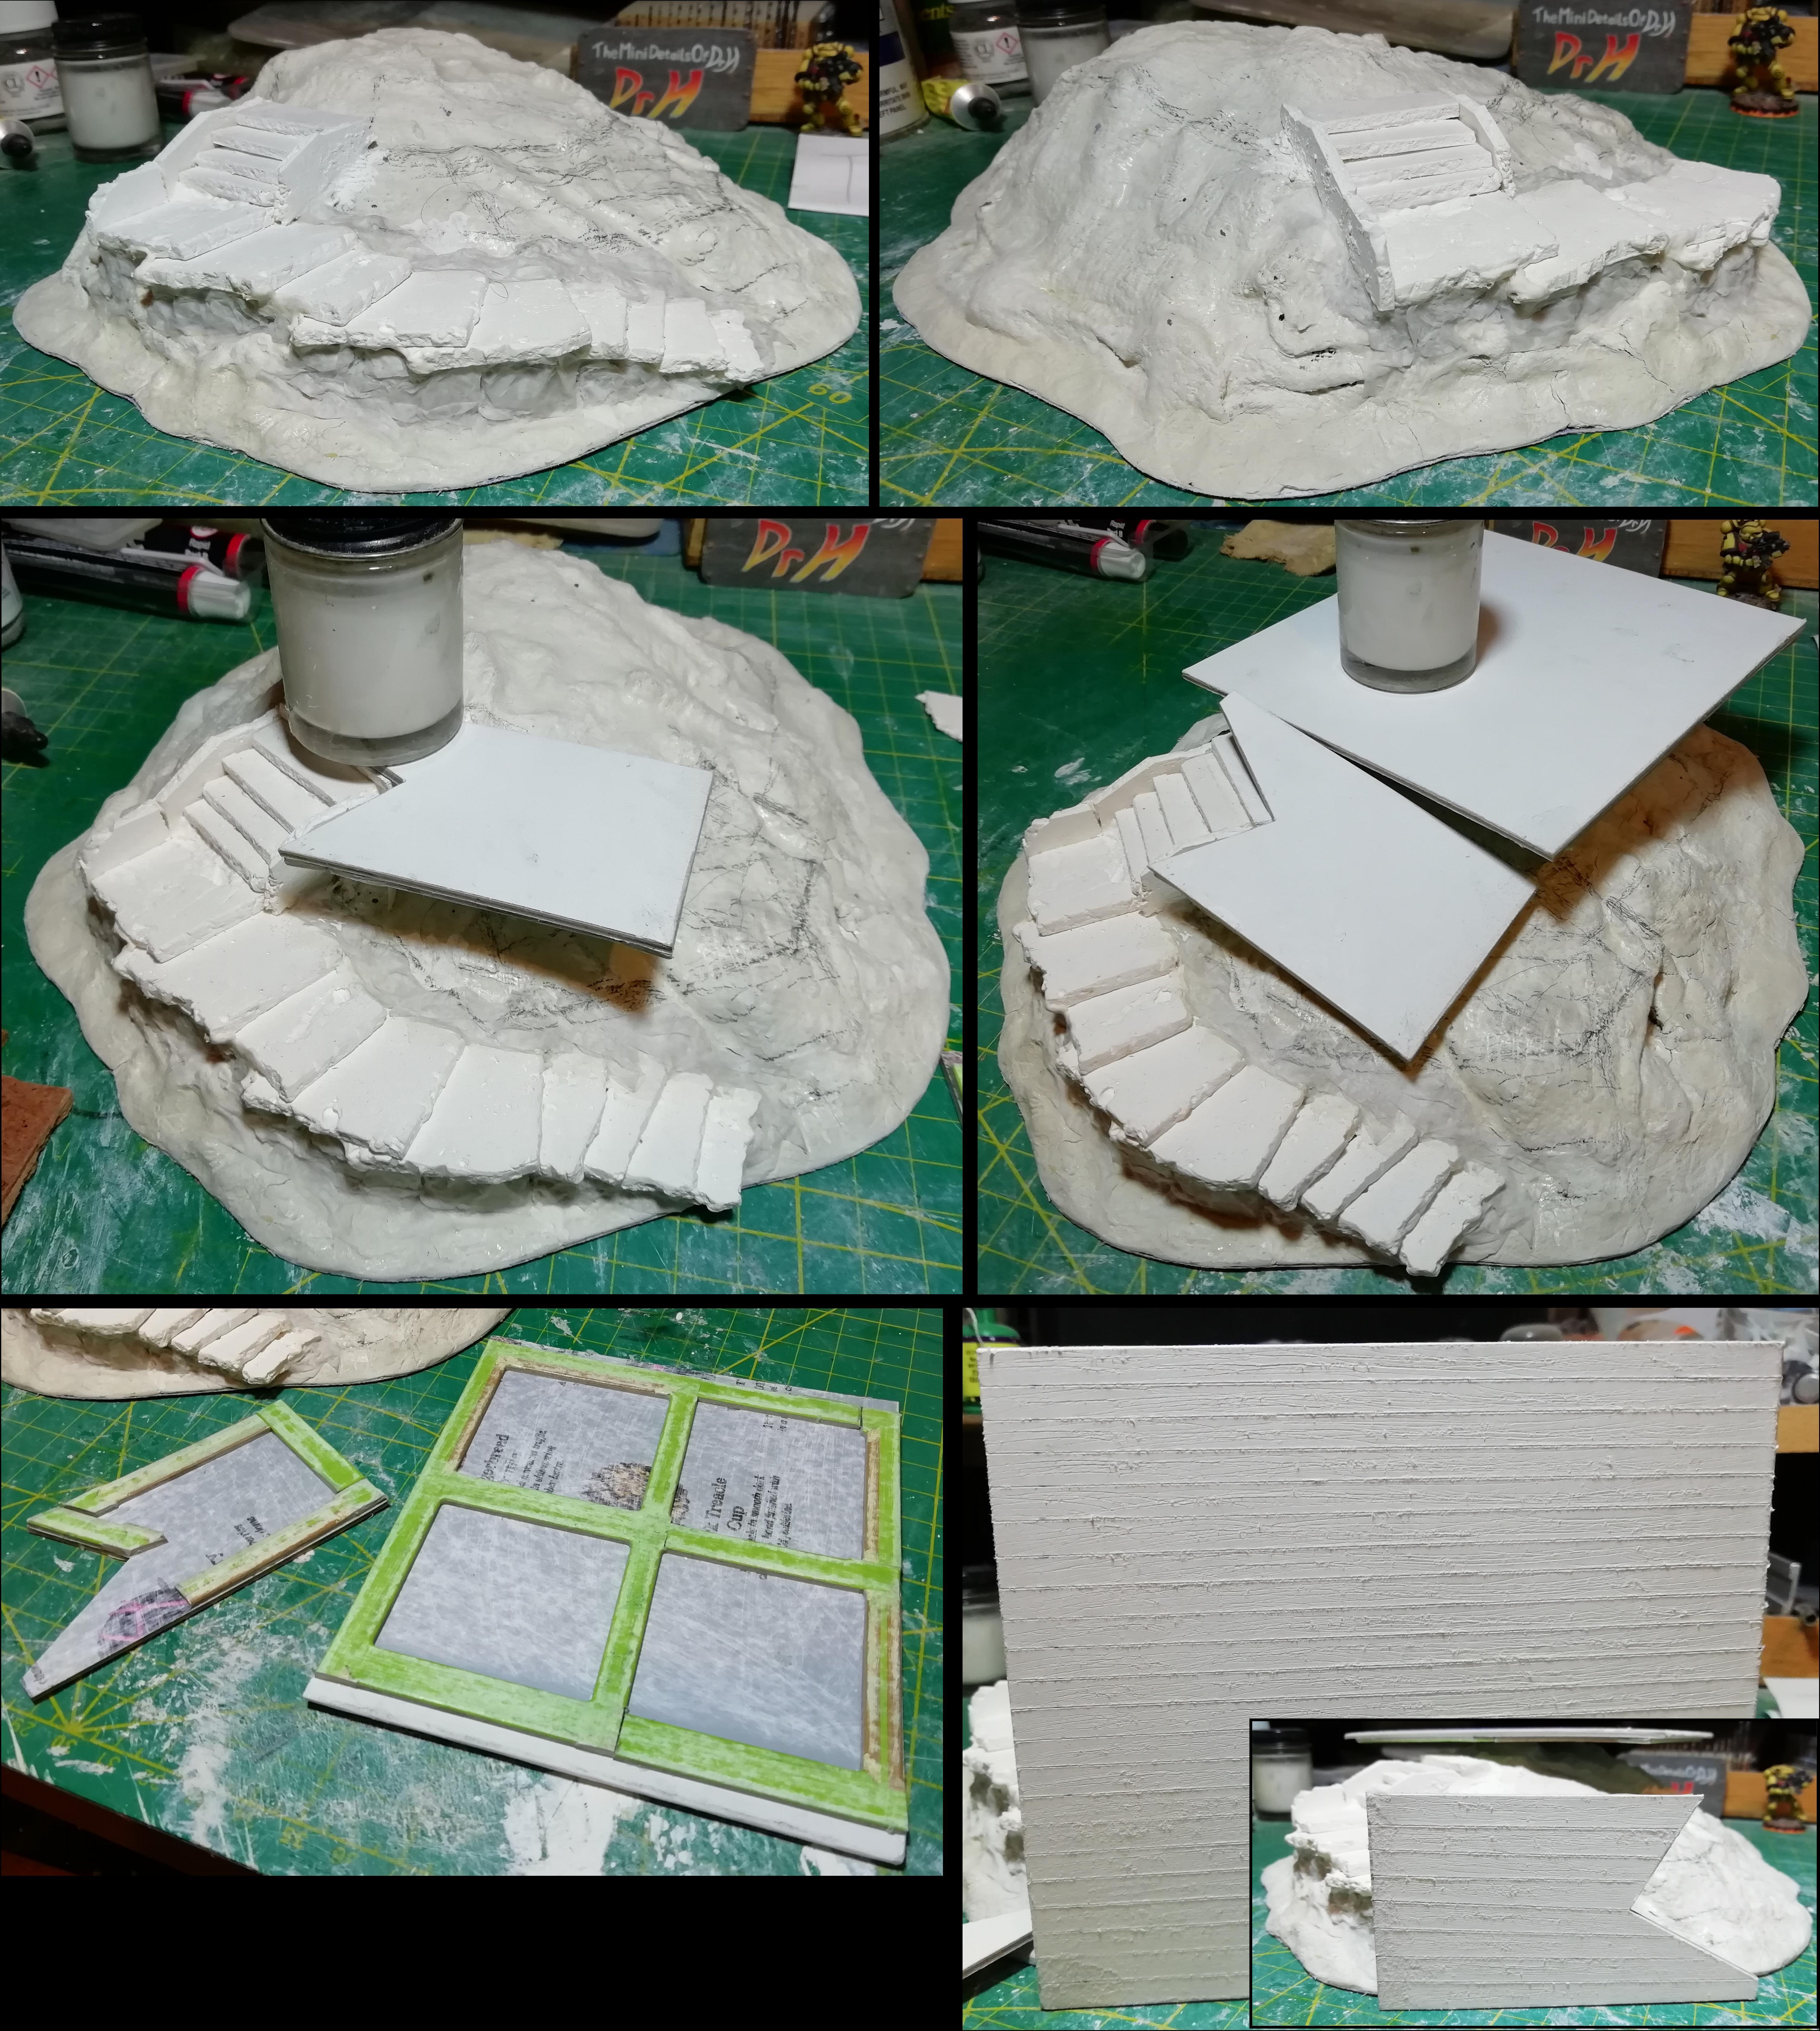 Mound wip 3; steps and platforms